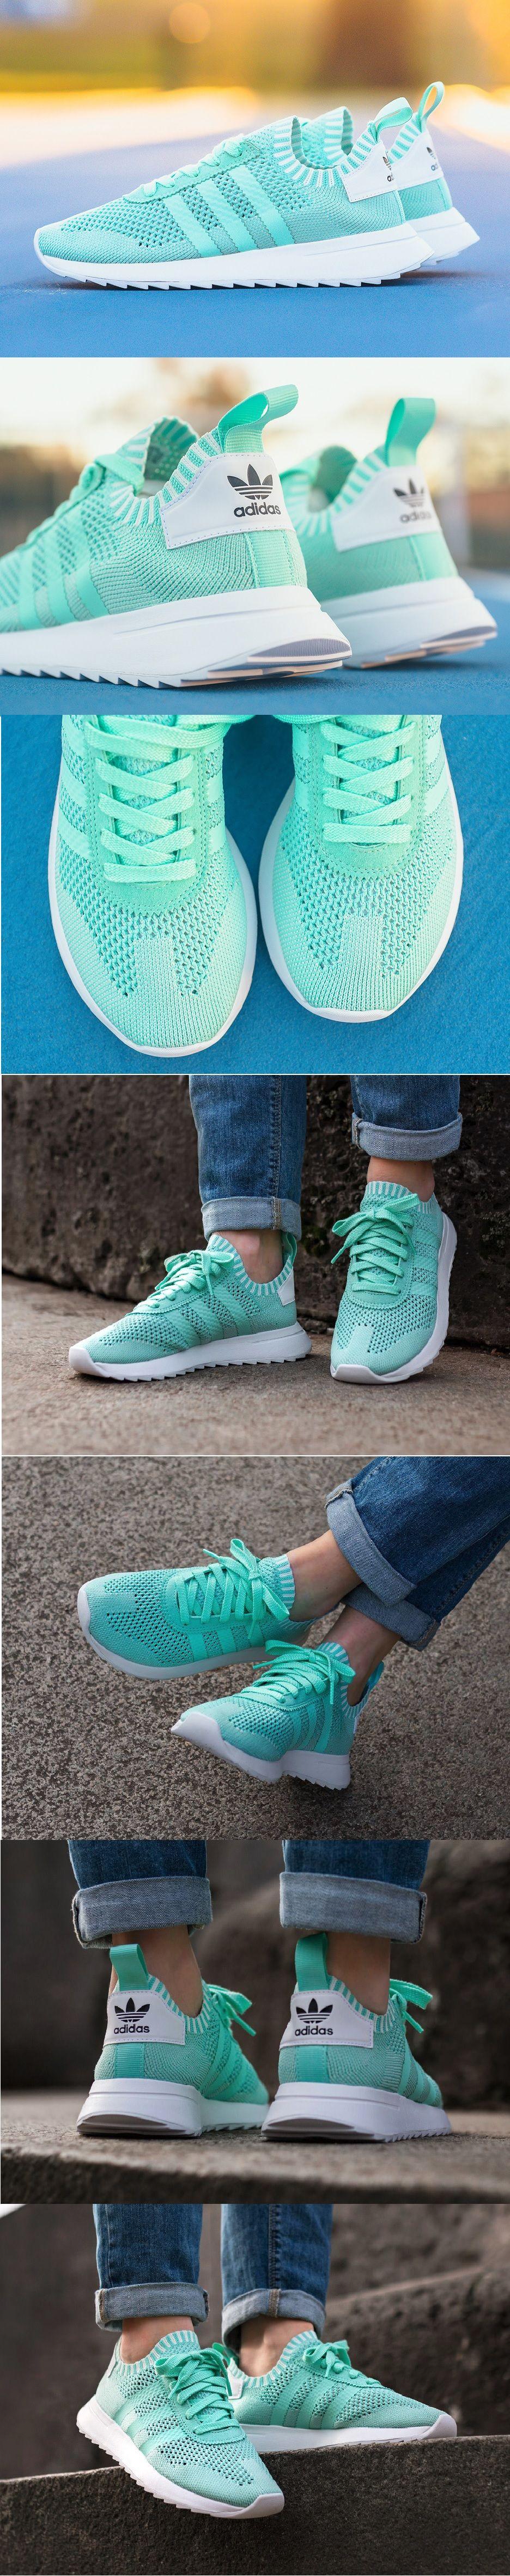 Adidas flashback primeknit w facile verde il mio stile pinterest